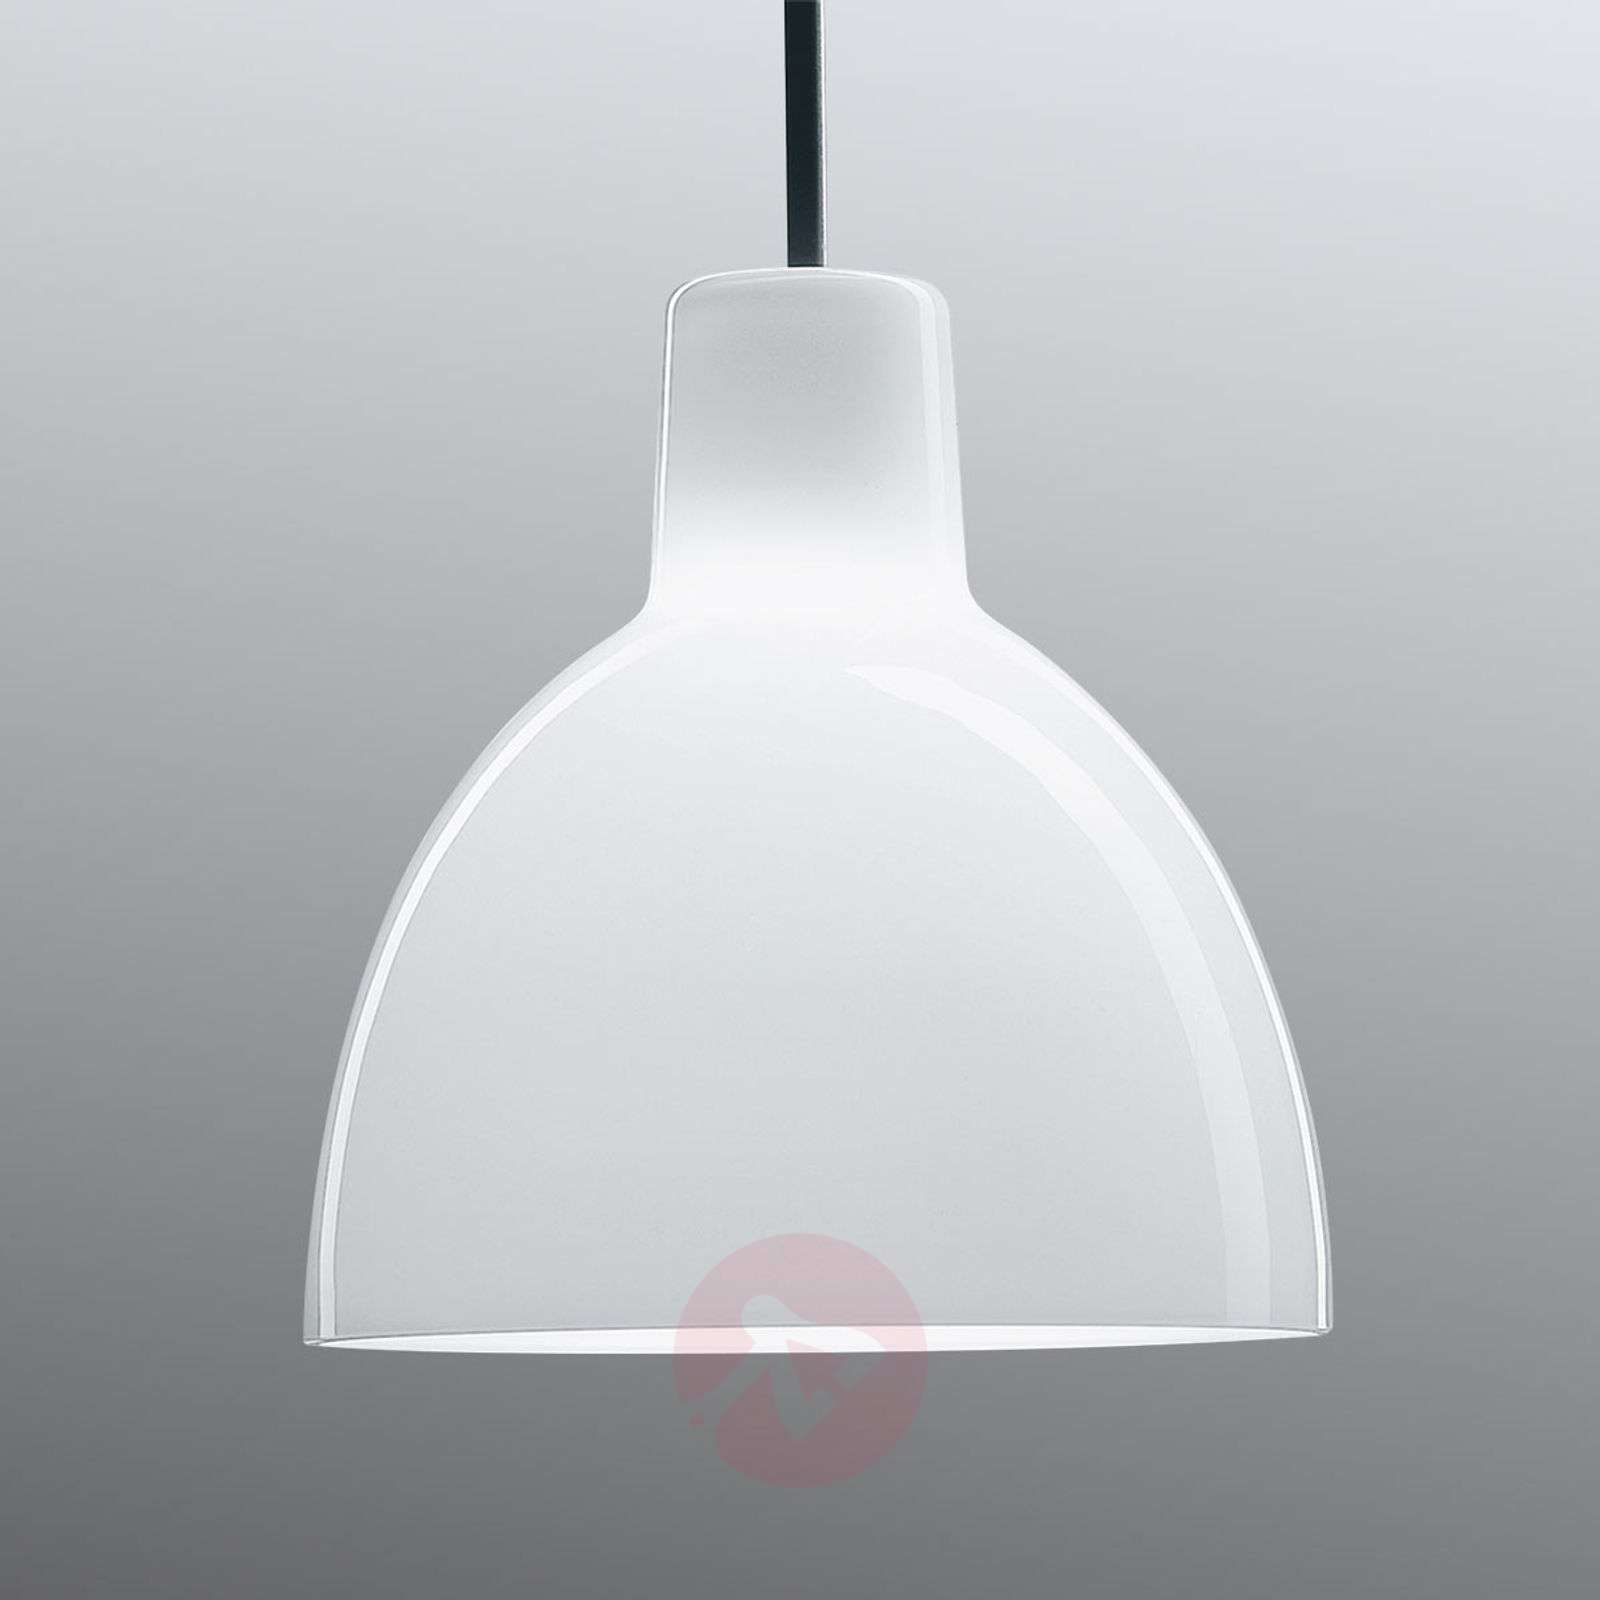 Louis Poulsen Toldbod hanging light 22 cm-6090060-01